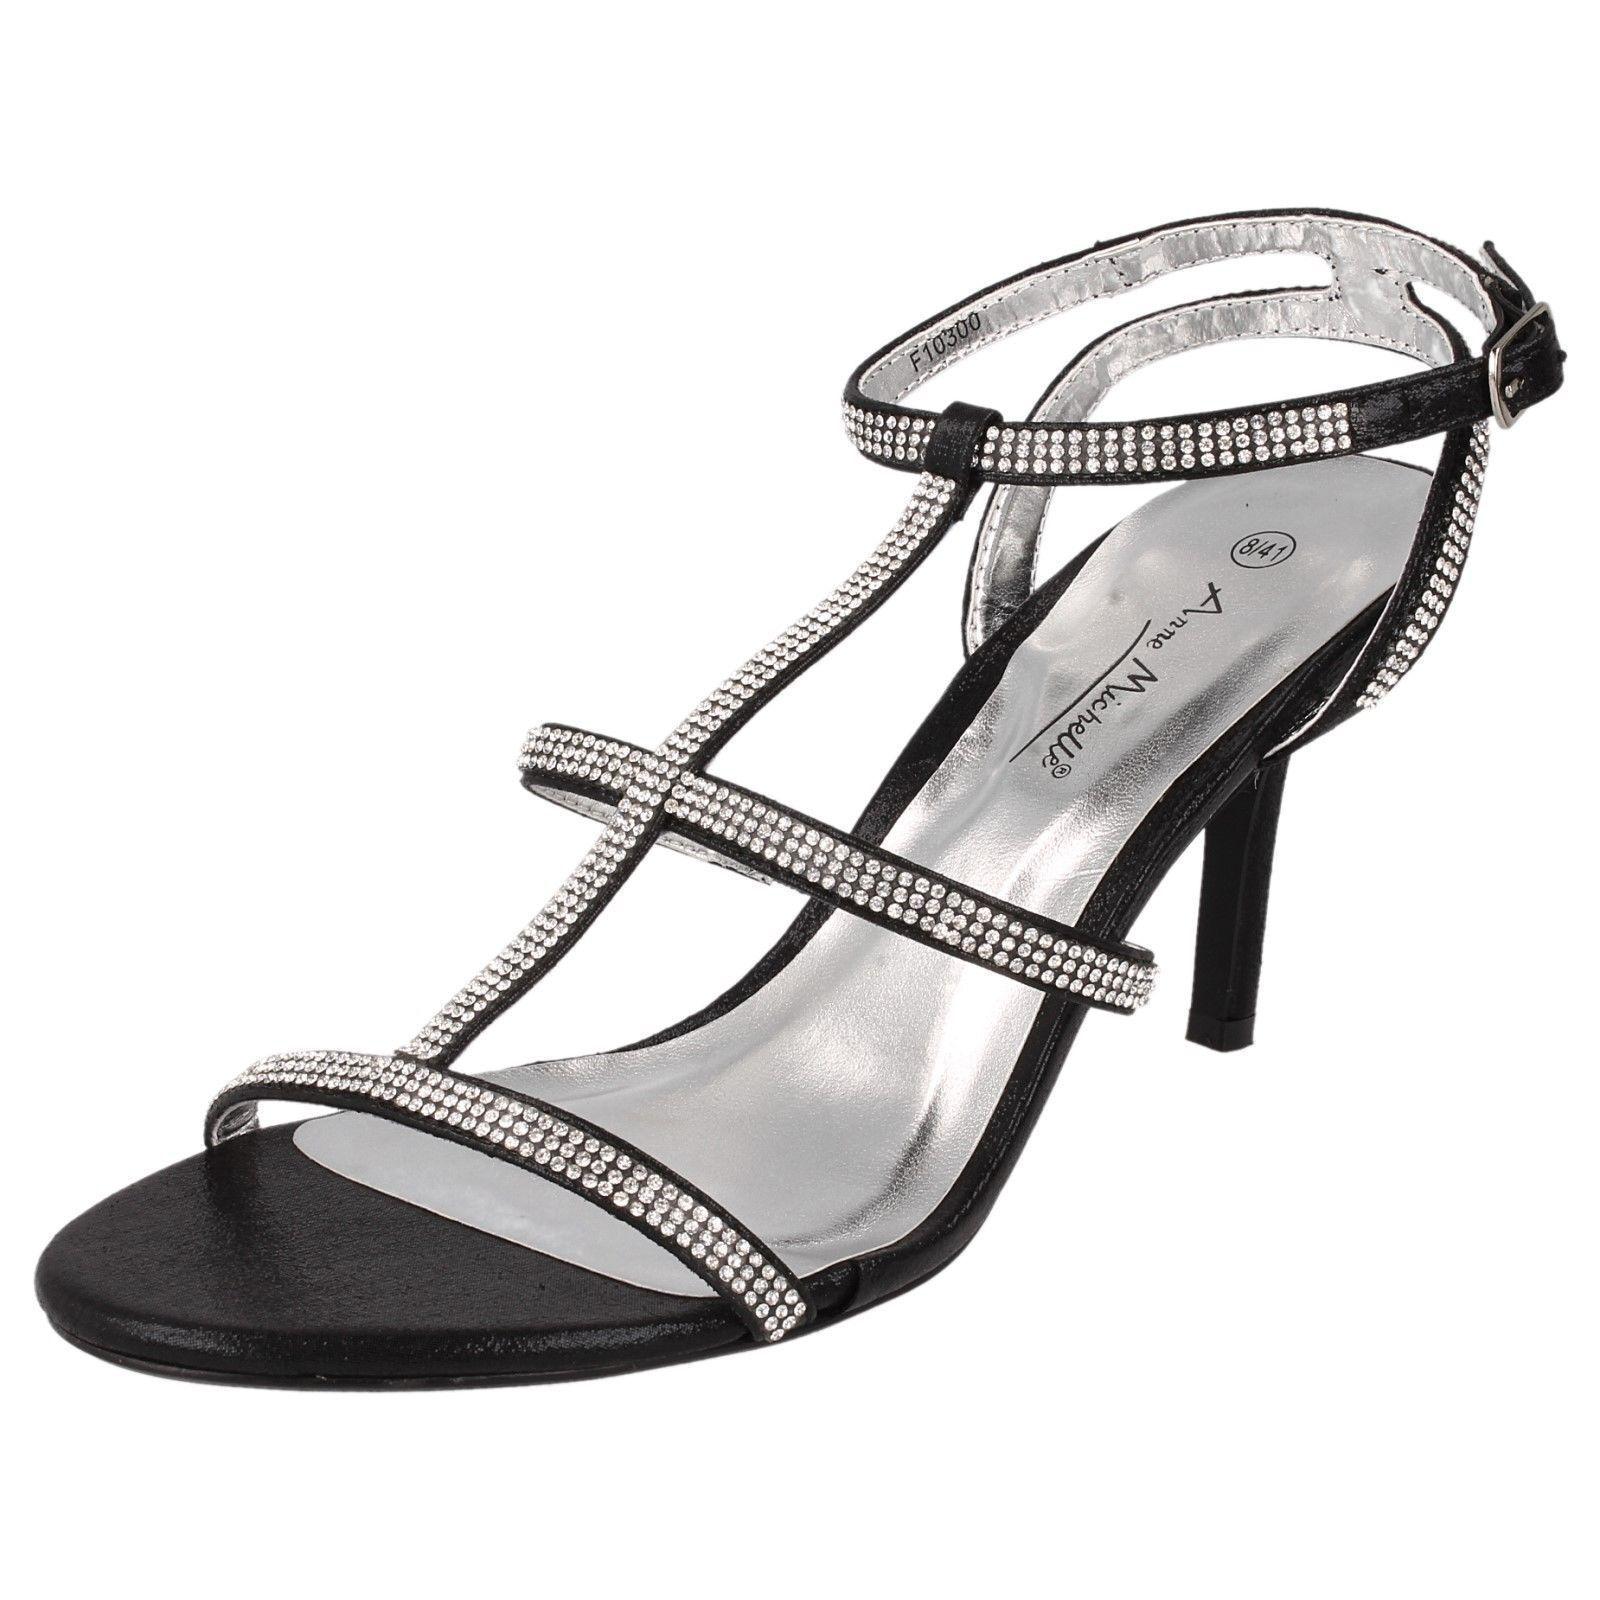 как выглядит Ladies Black DIAMANTE Slingback Sandals F10300 WEDDING/PARTY